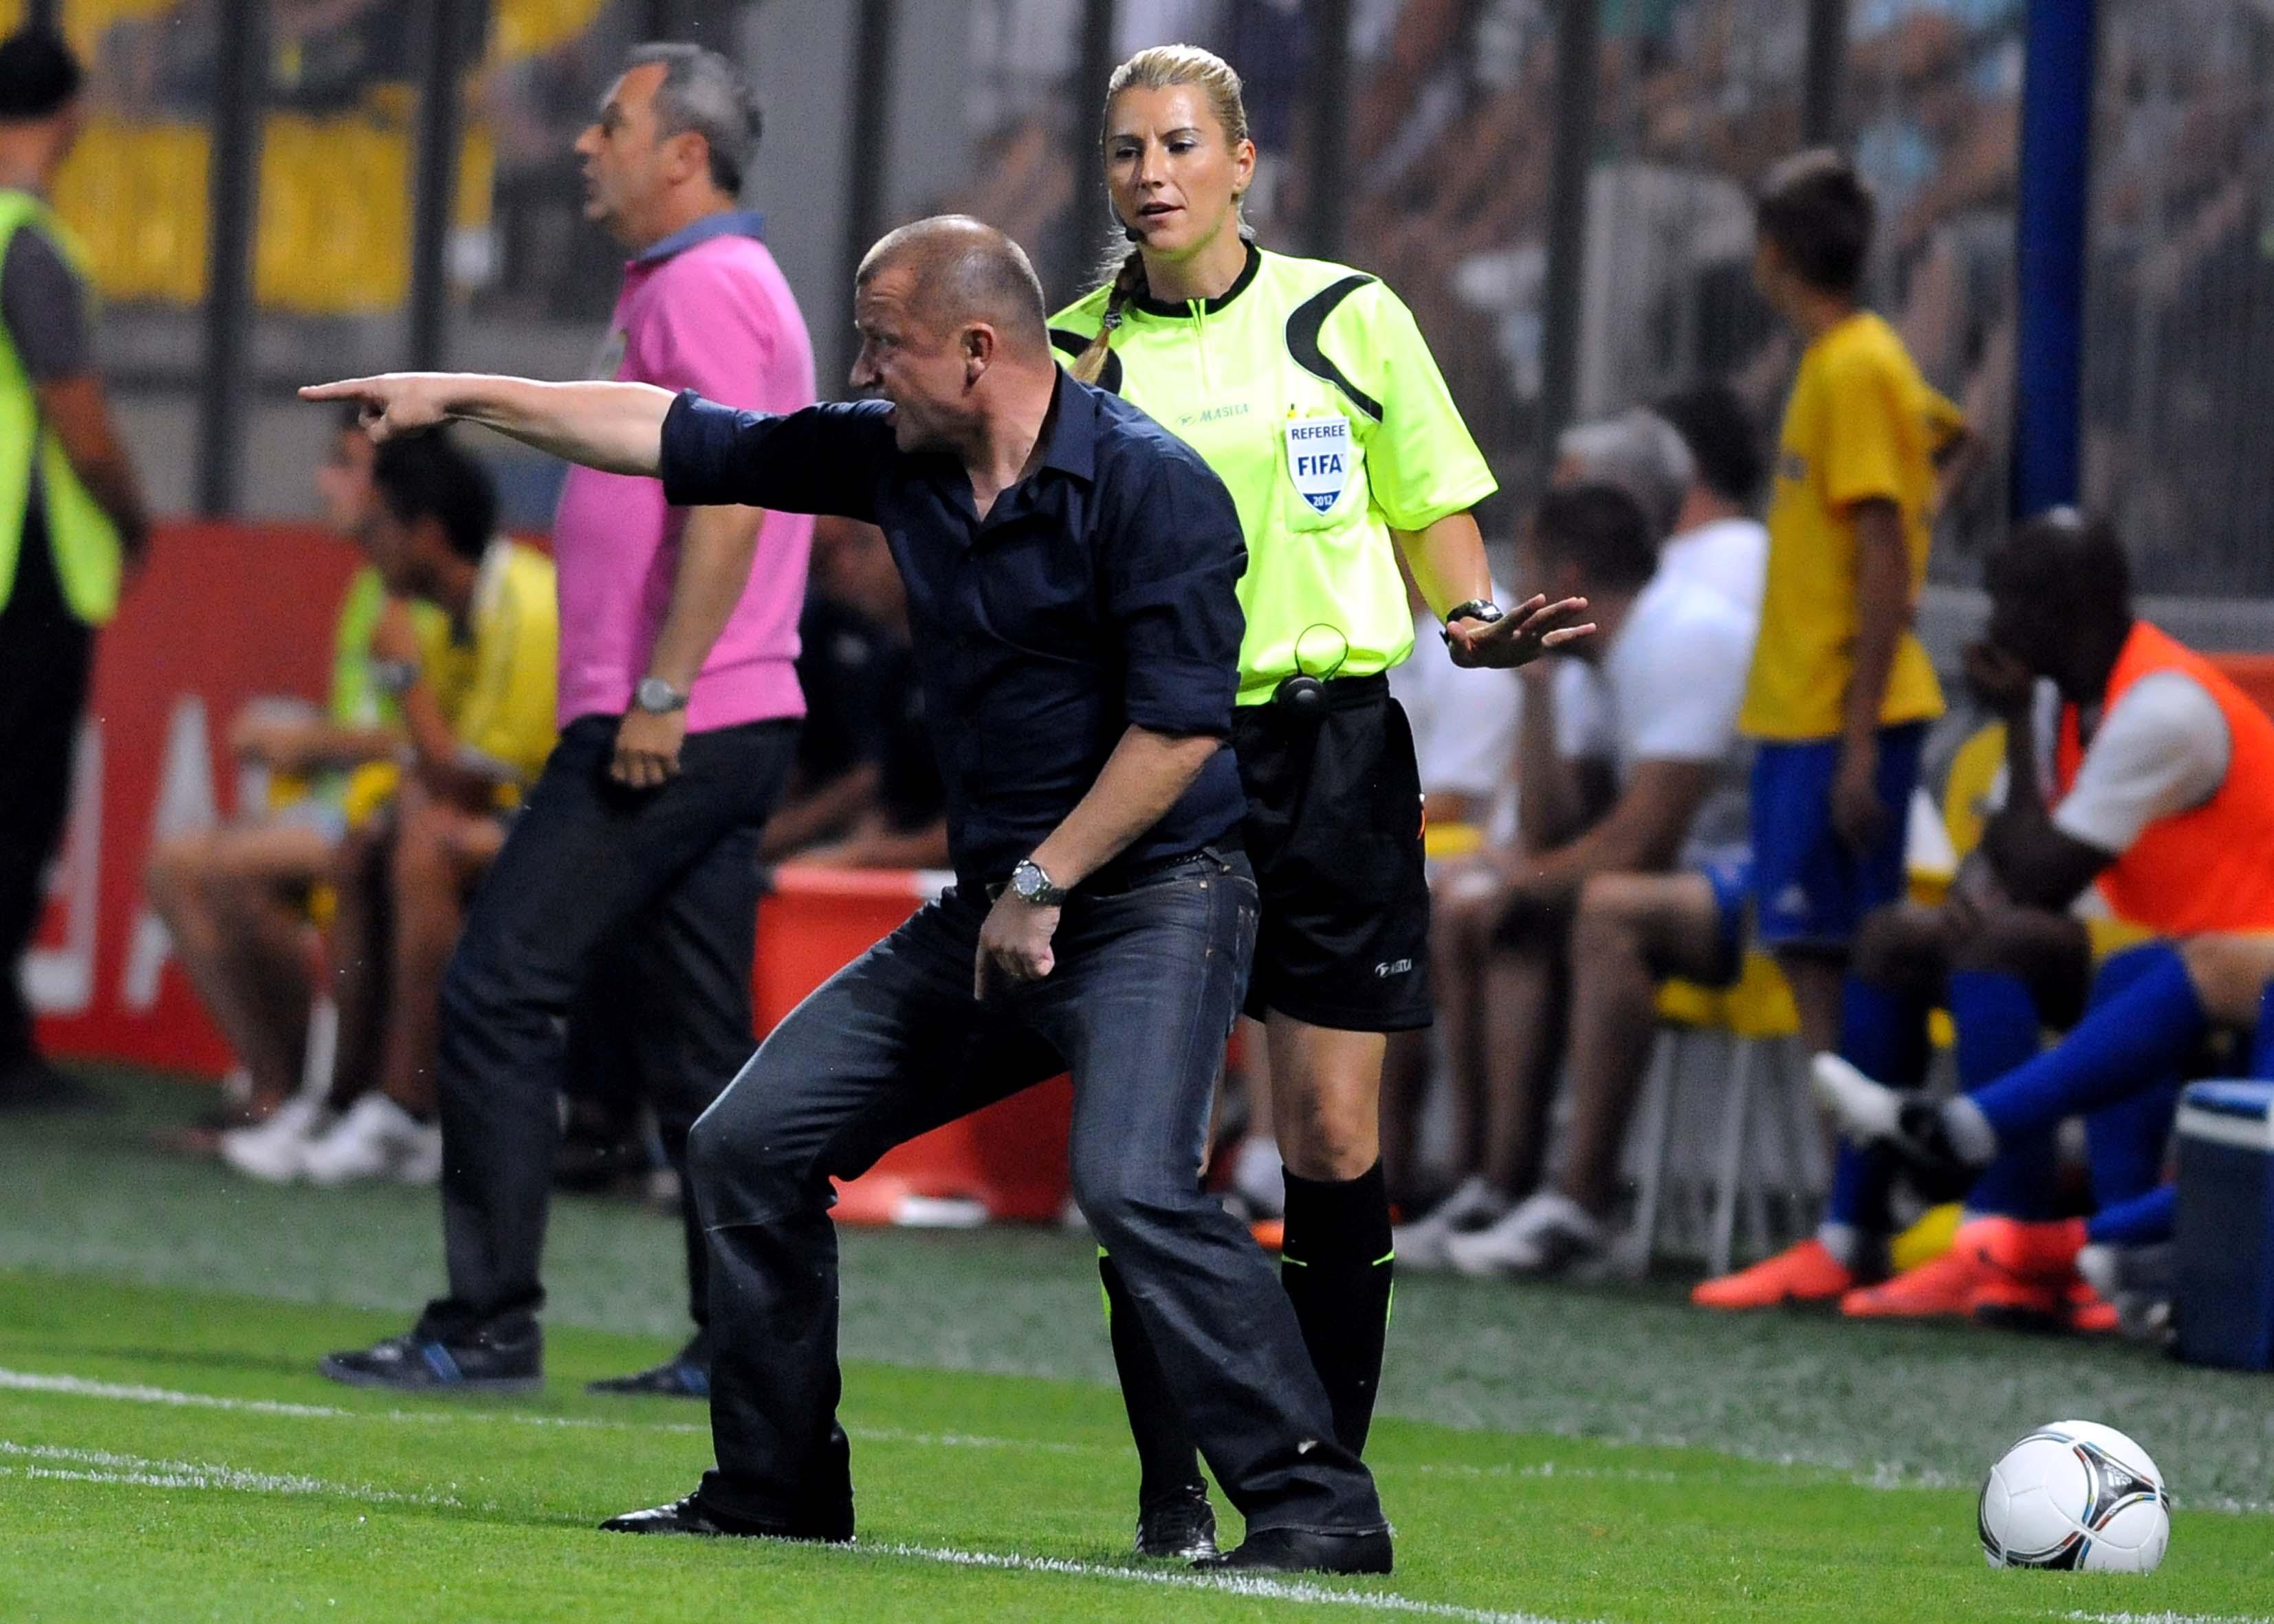 FOTBAL:FC PETROLUL PLOIESTI-OTELUL GALATI 1-0,LIGA 1 (4.08.2012)